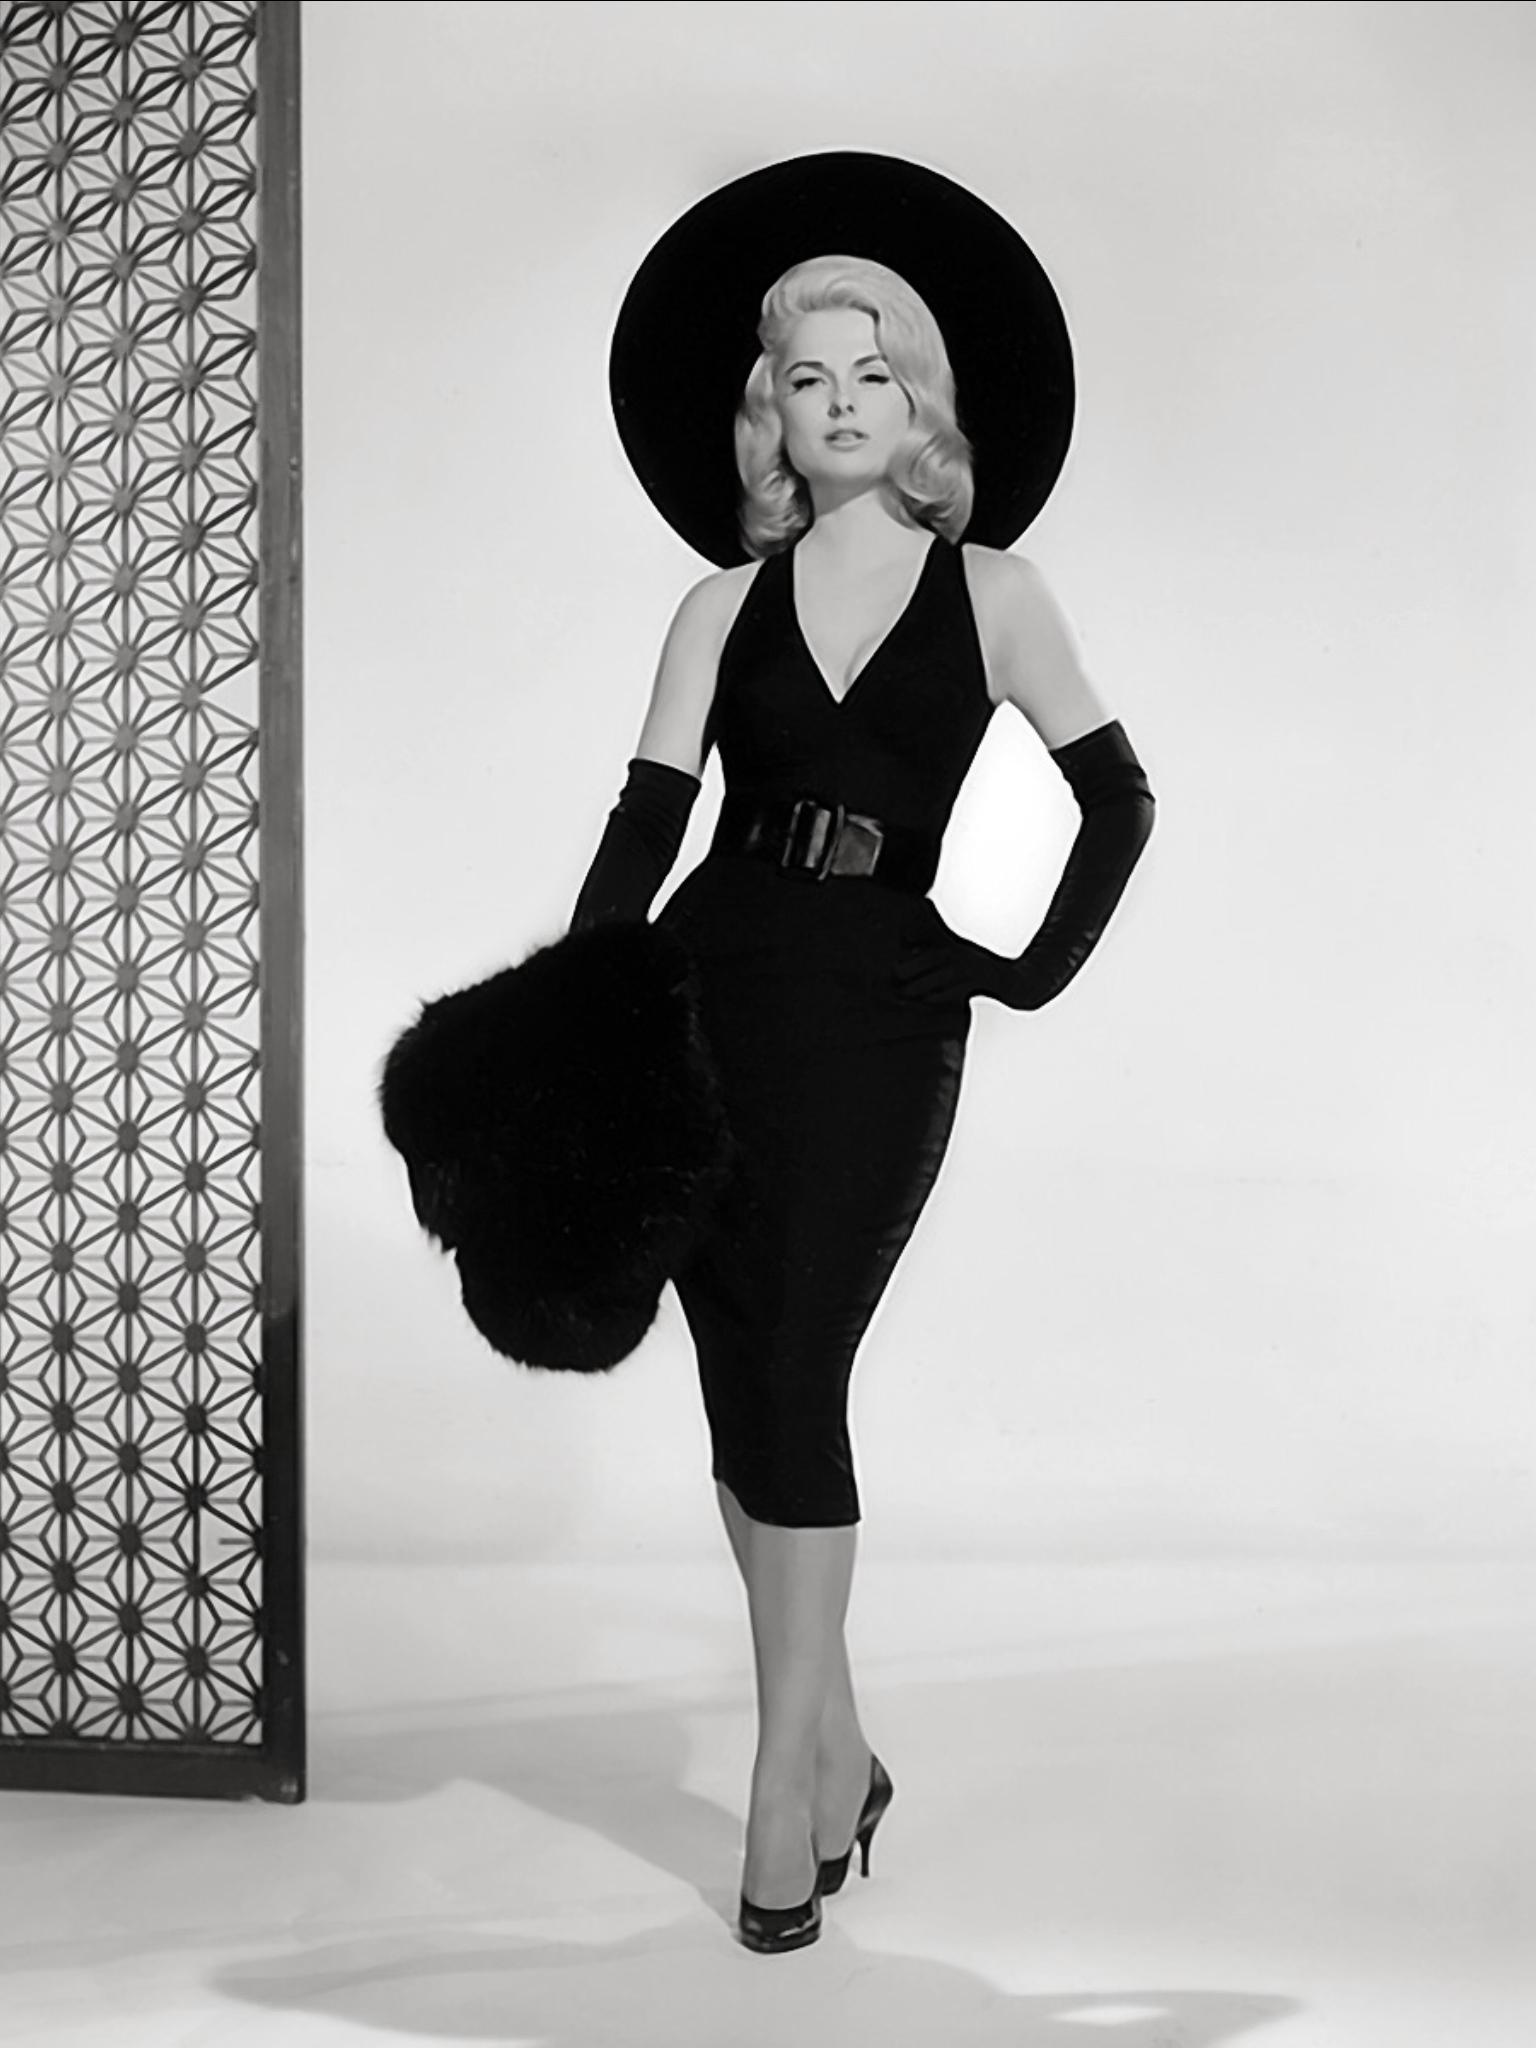 Martha Hyer, The Carpetbaggers, 1964 | Look, Looks, Filmes